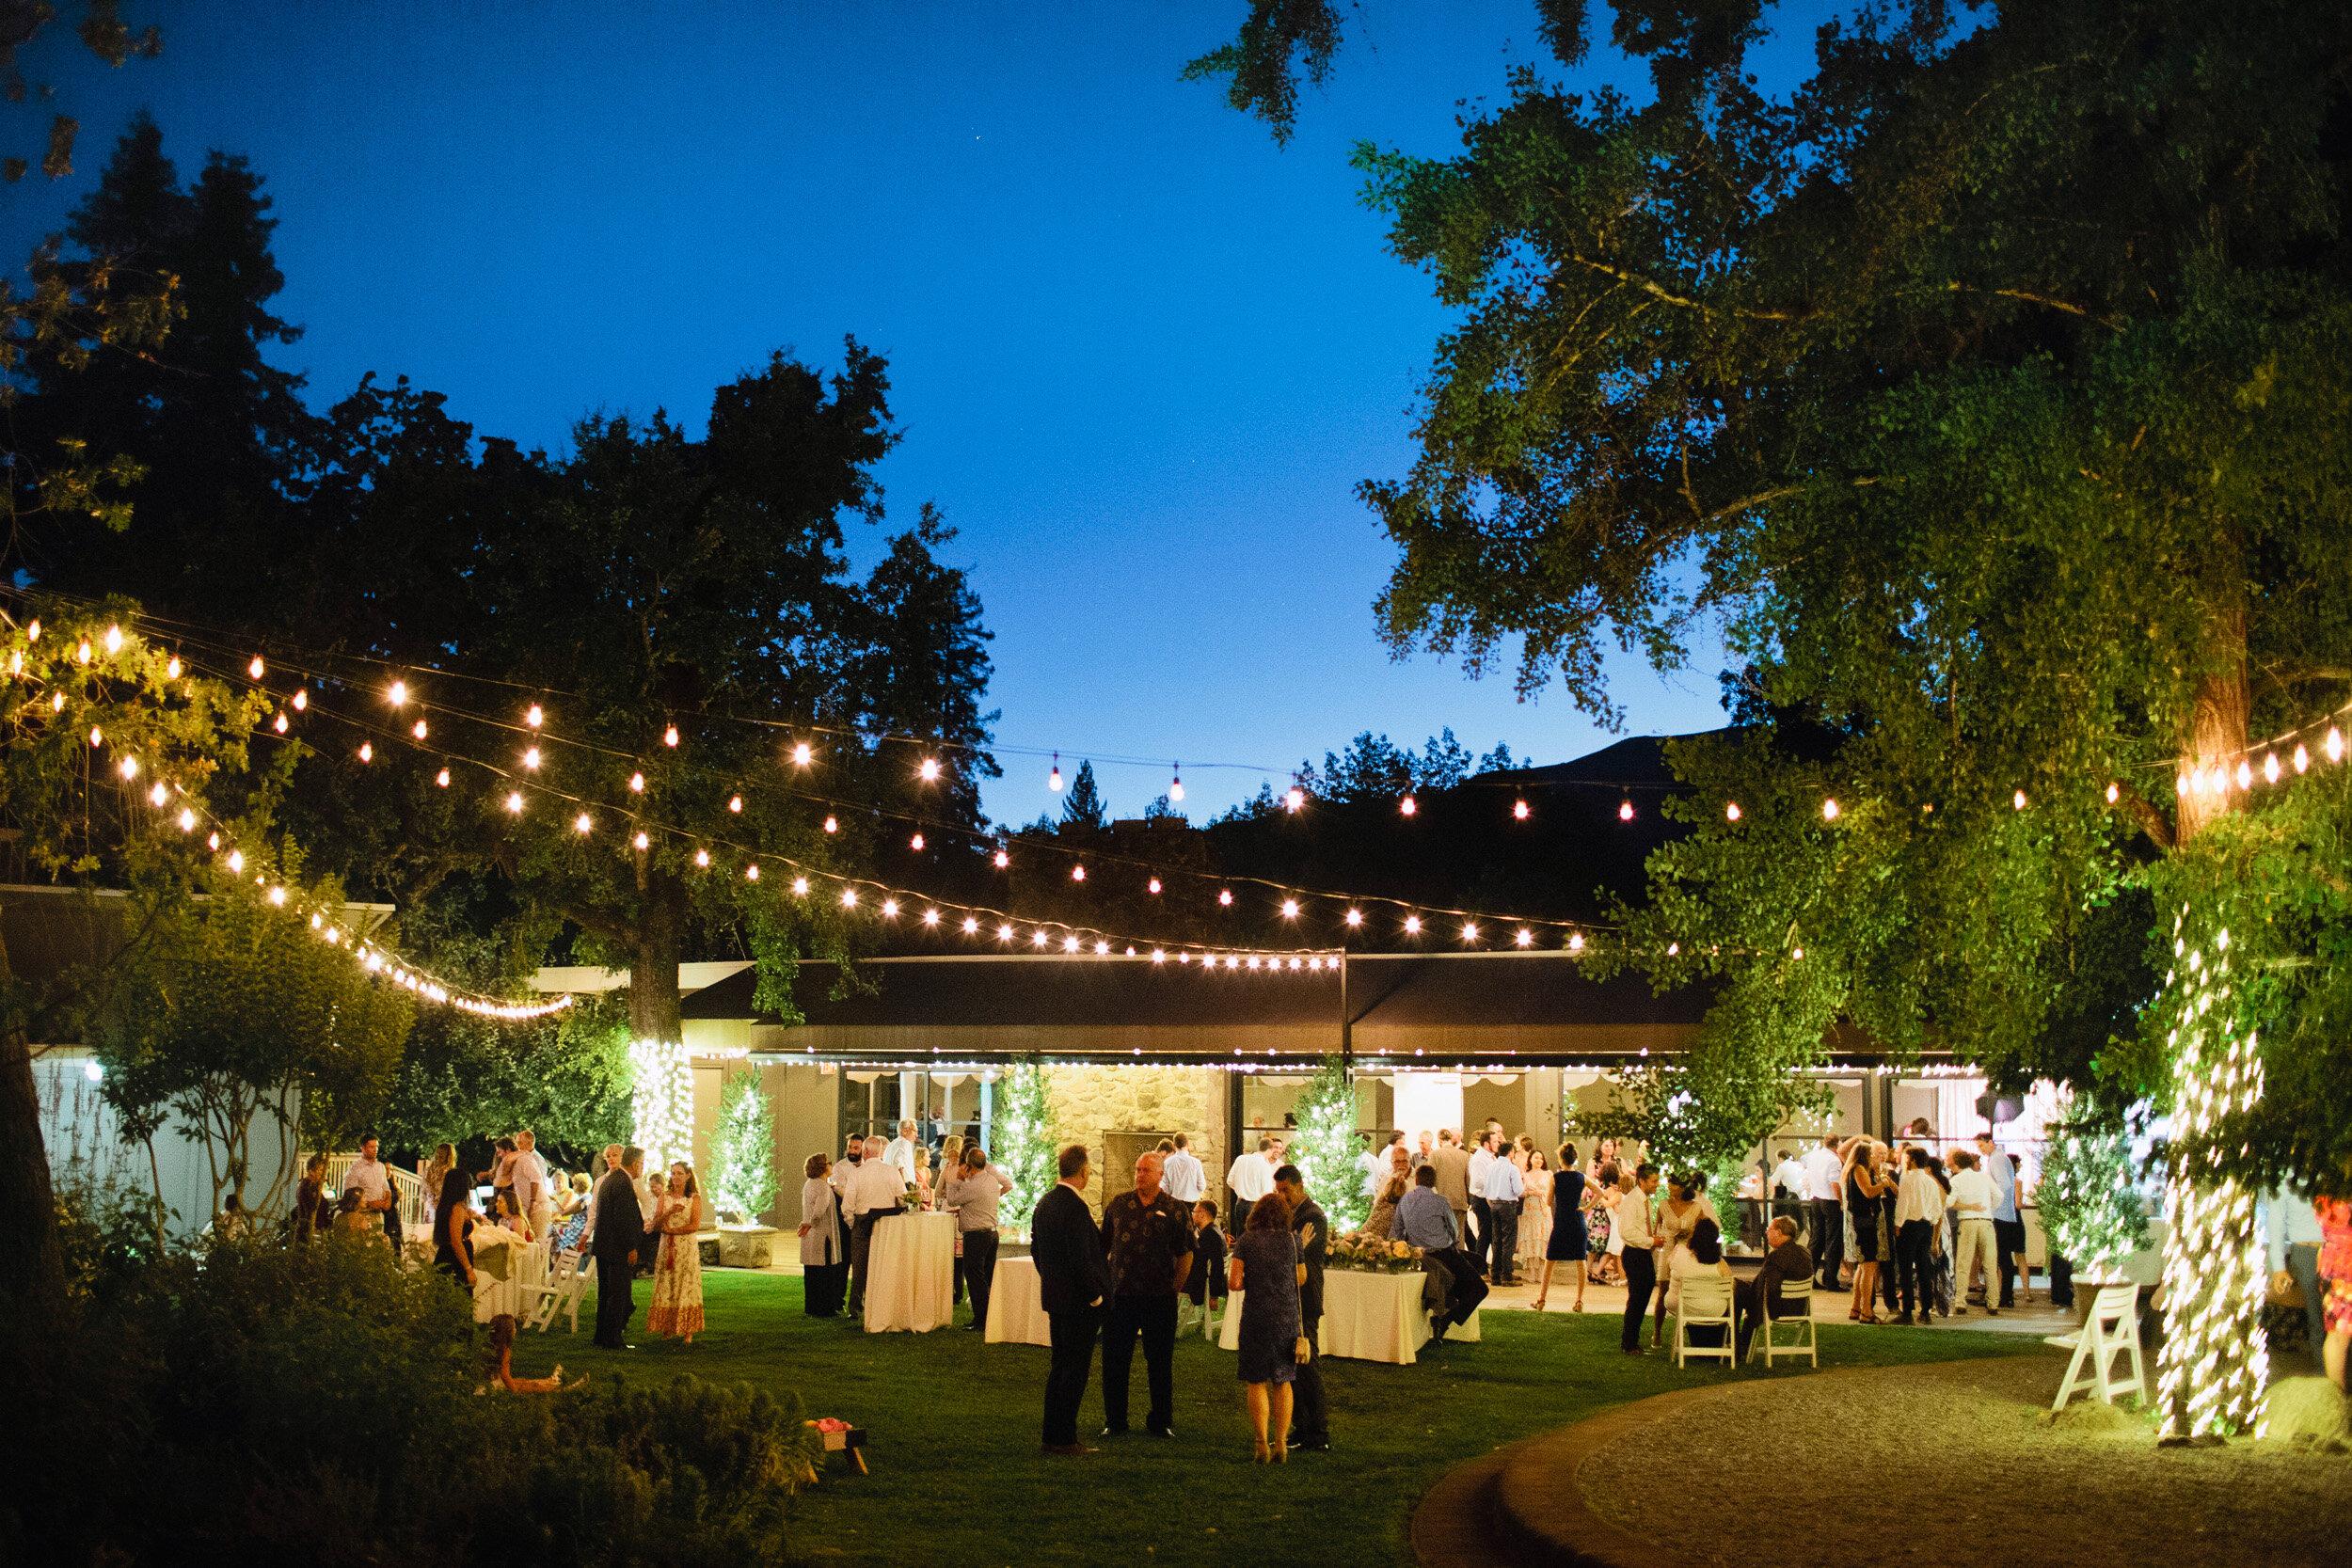 Marin-Art-Garden-Center-Wedding-78.JPG